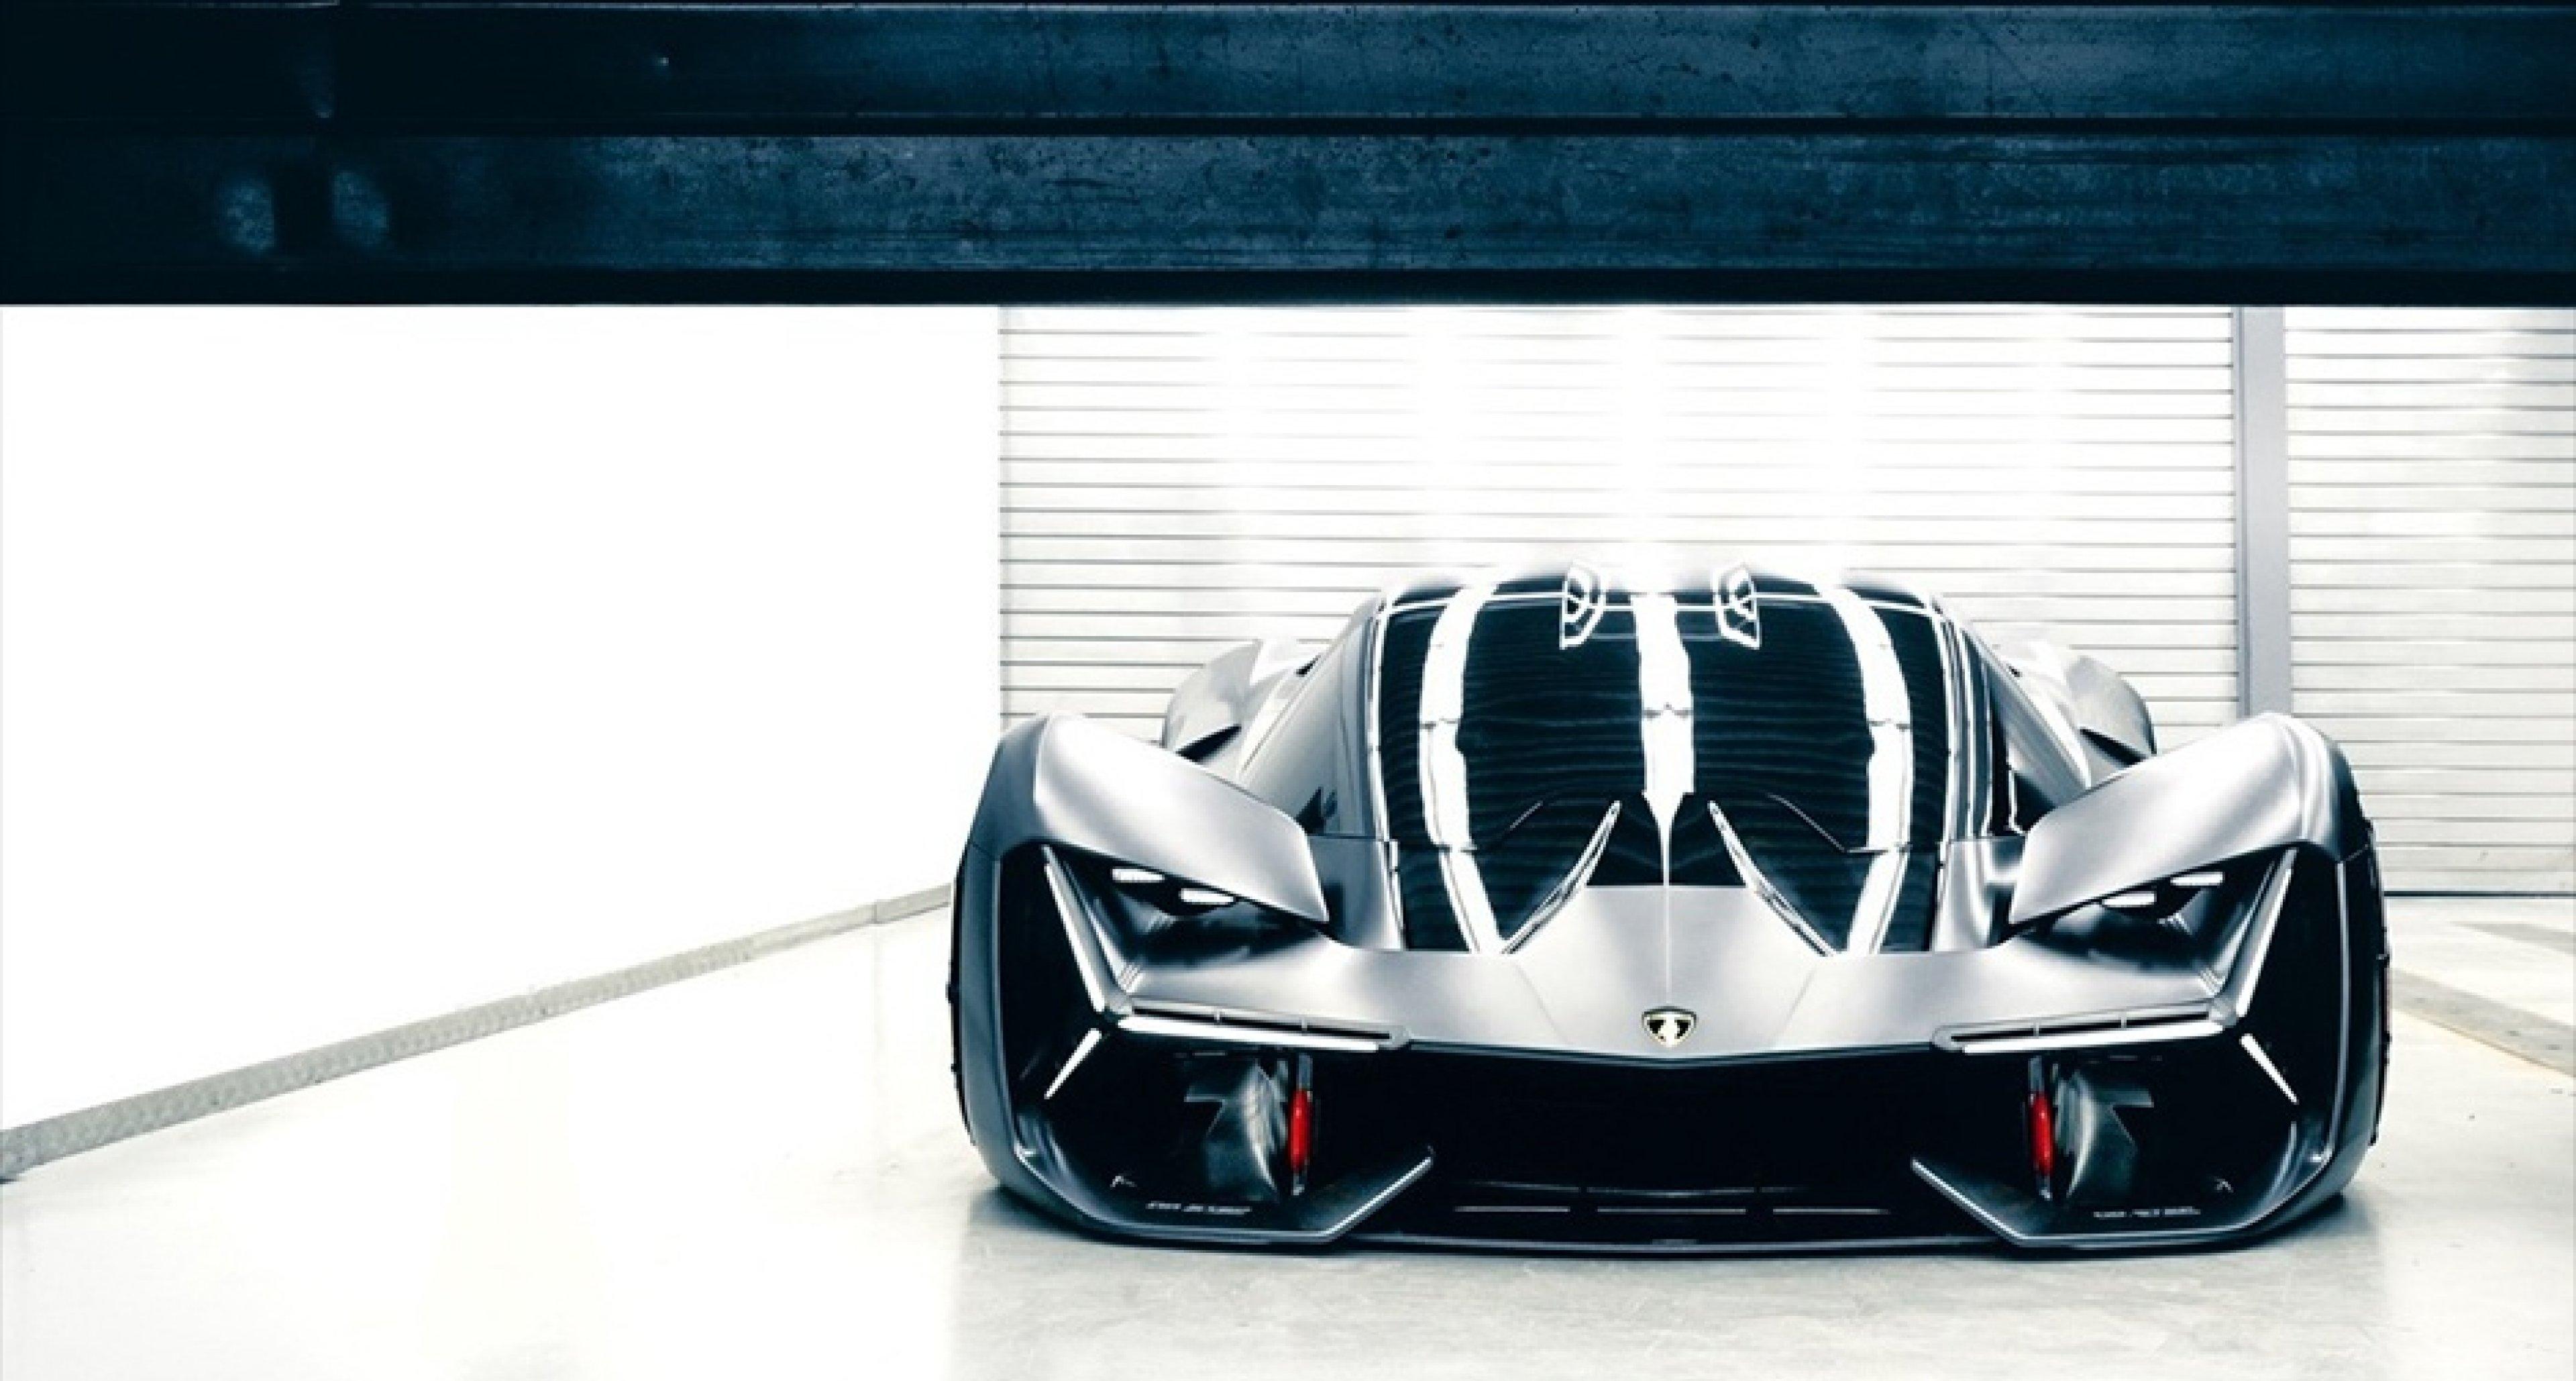 Best Lamborghini Terzo Millennio - lamborghini_terzo_08  Trends_683624.jpg?itok\u003dUyMJn5A1